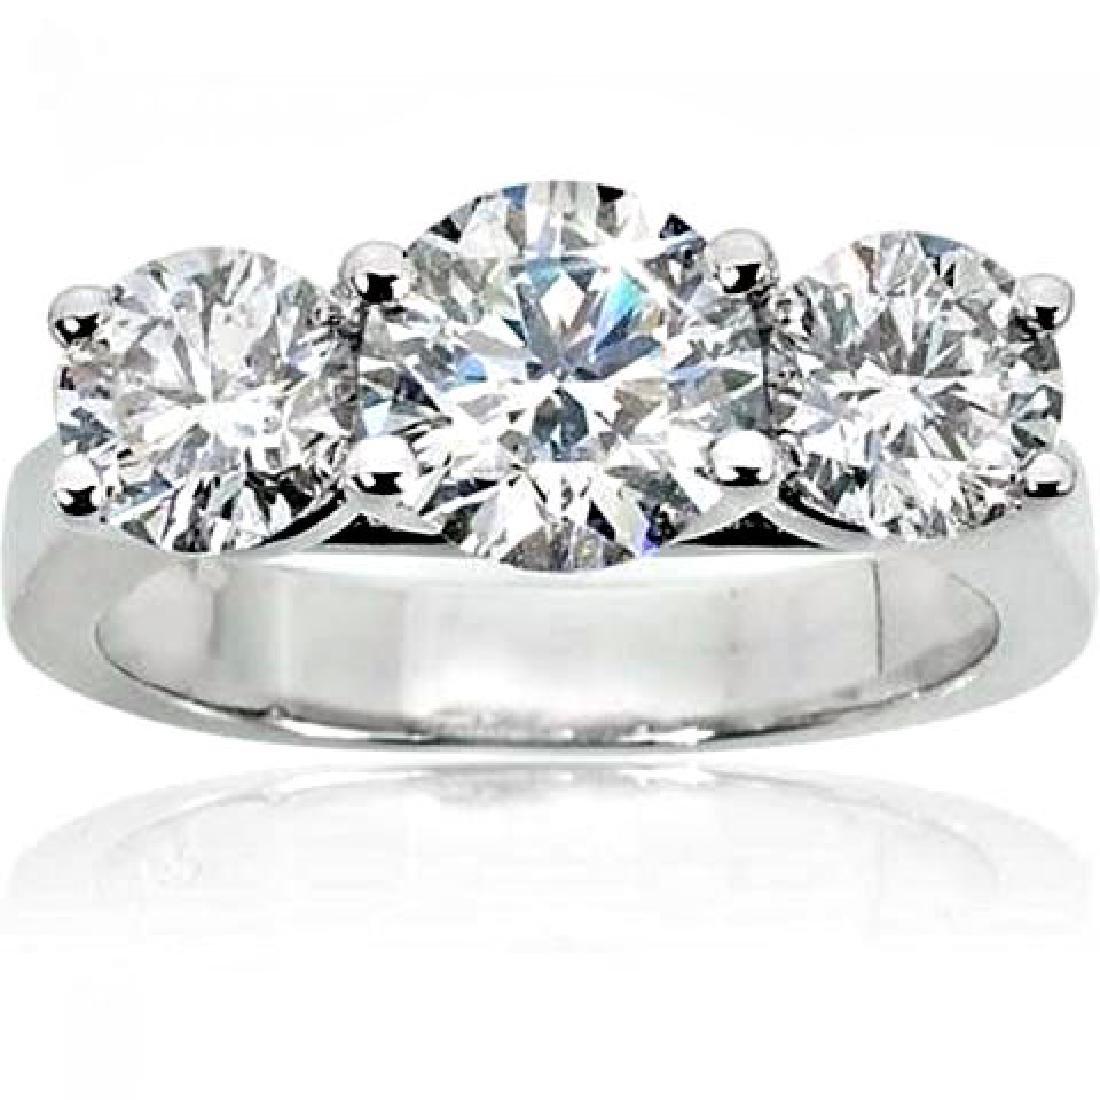 Present Past Future Diamond Ring 2.03Ct 14k White Gold